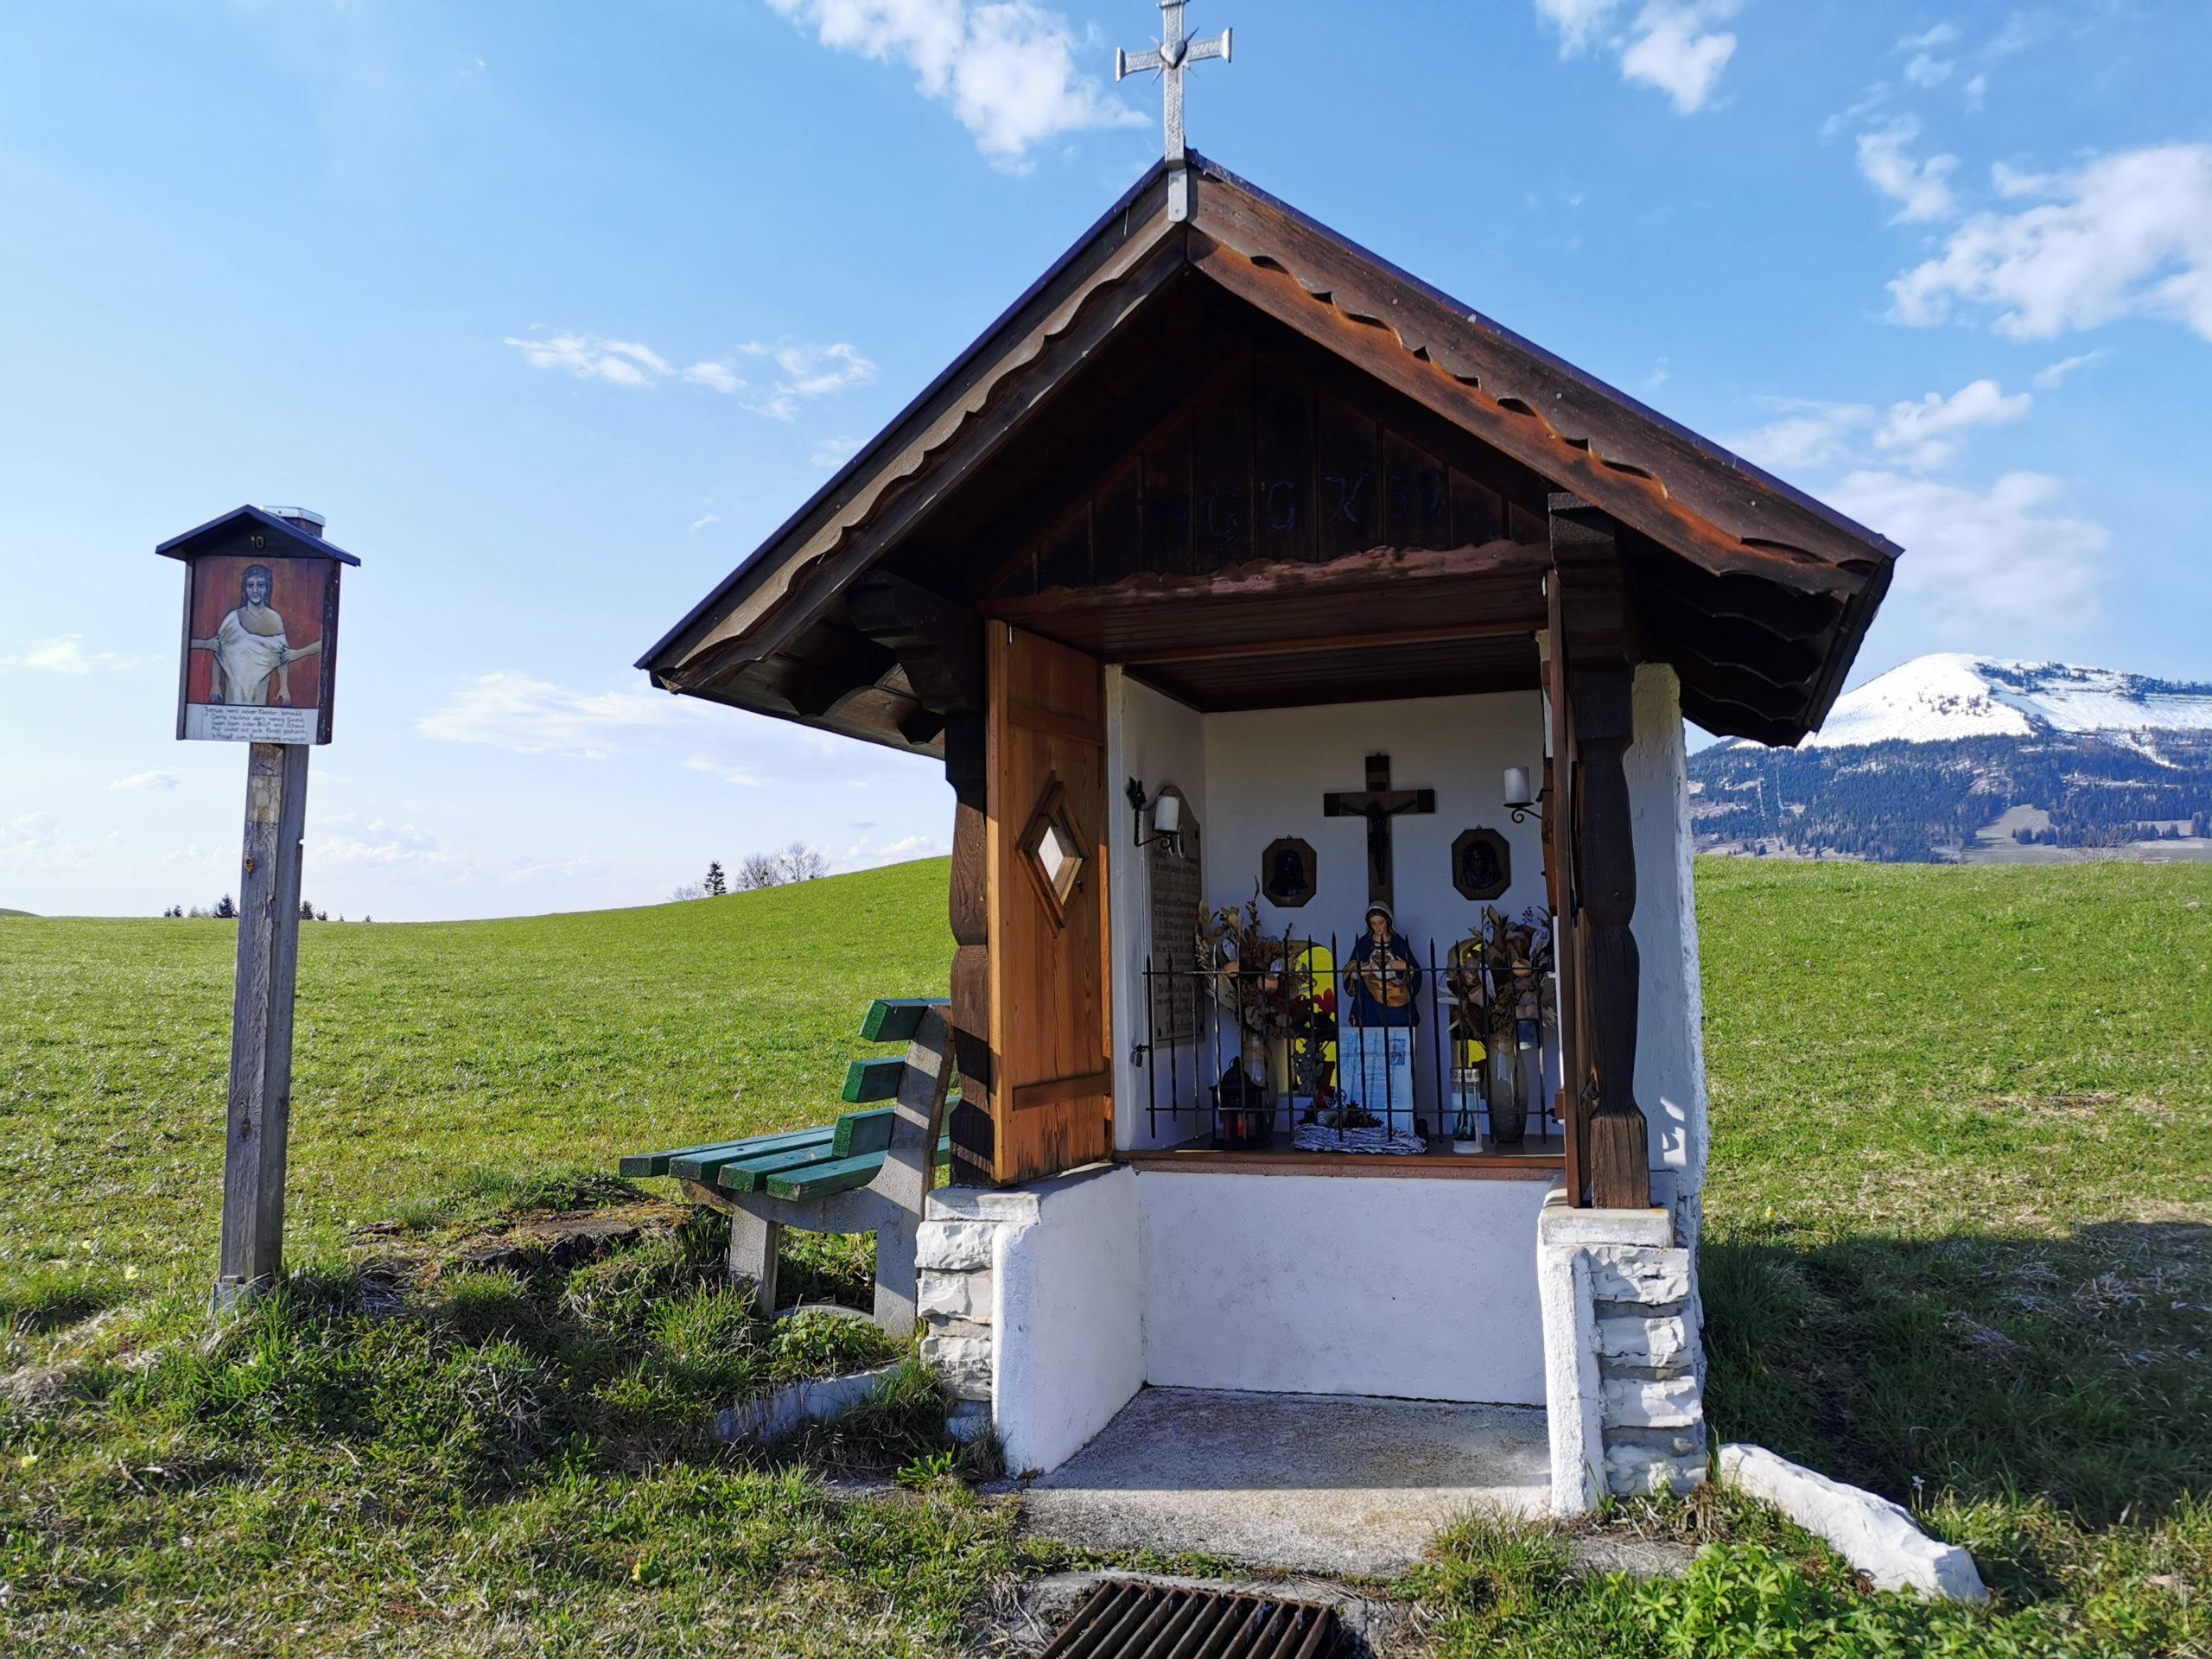 Von Kapelle zu Kapelle entlang des Taugler Mundartkreuzweges © AlmSinn Martina Egger